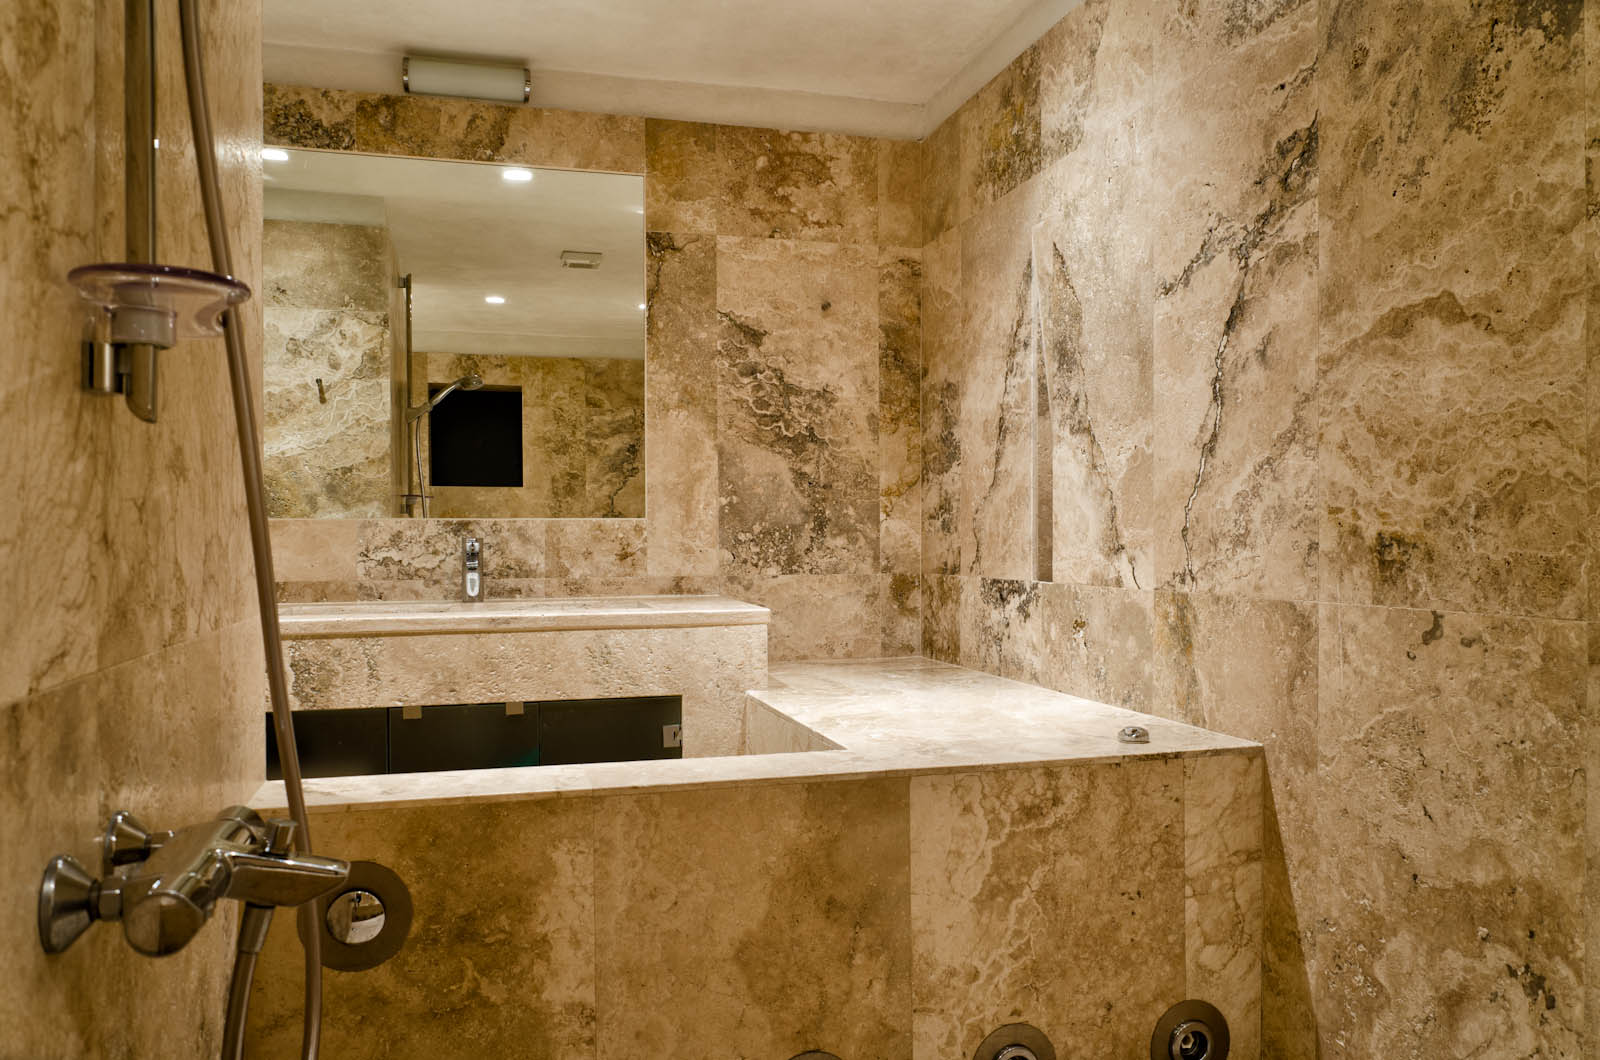 Villa waddell in fiesole toskana naturstein - Pietre per bagno ...